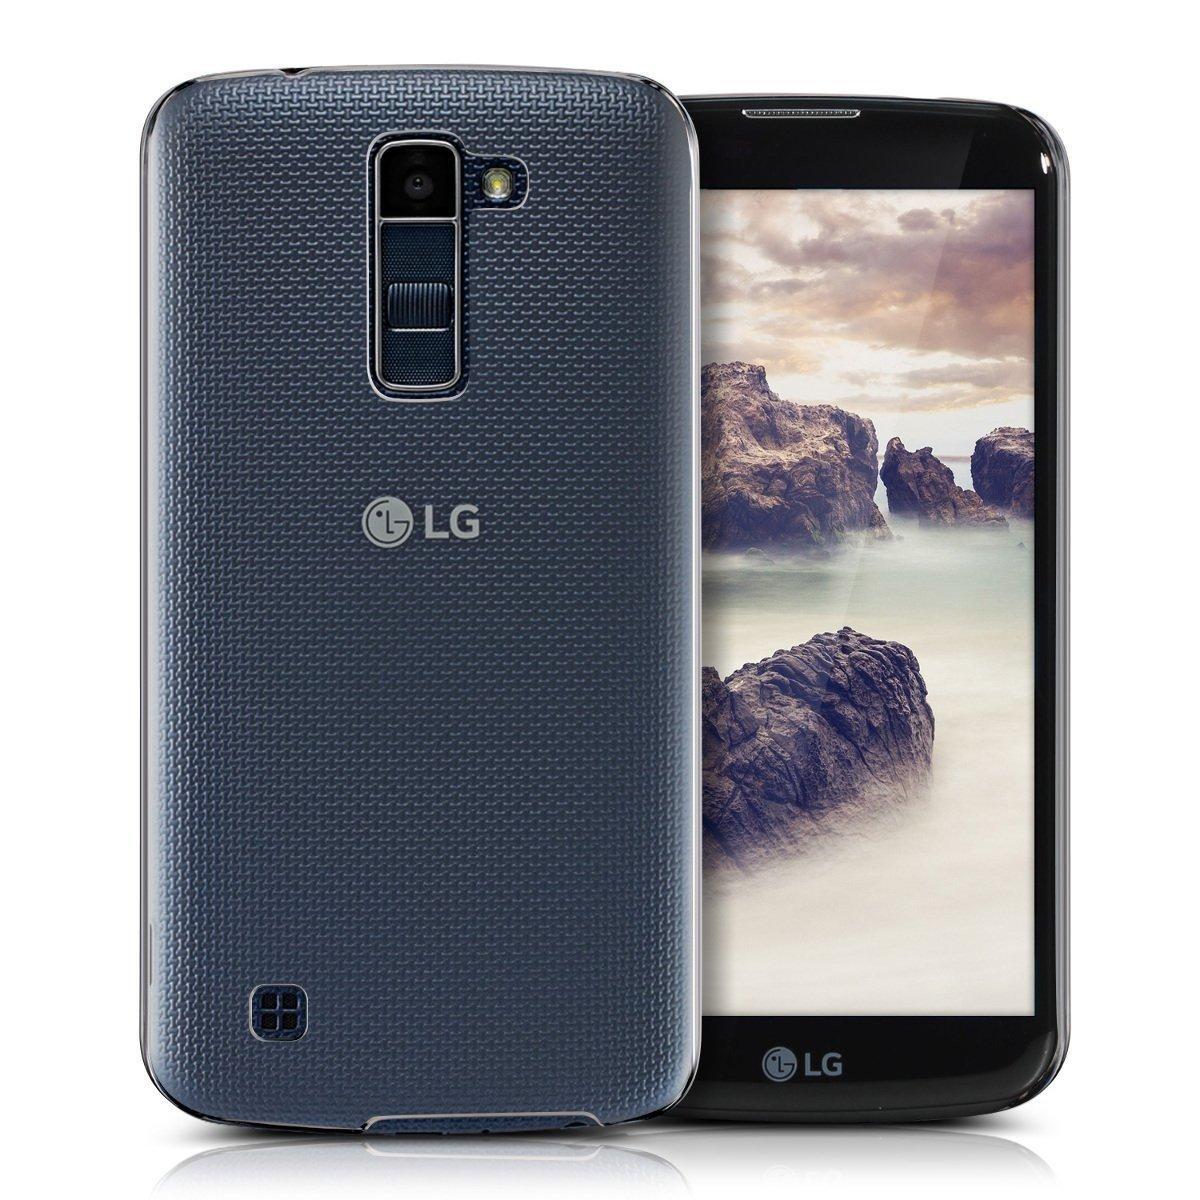 Hoesje LG K10 hard case transparant